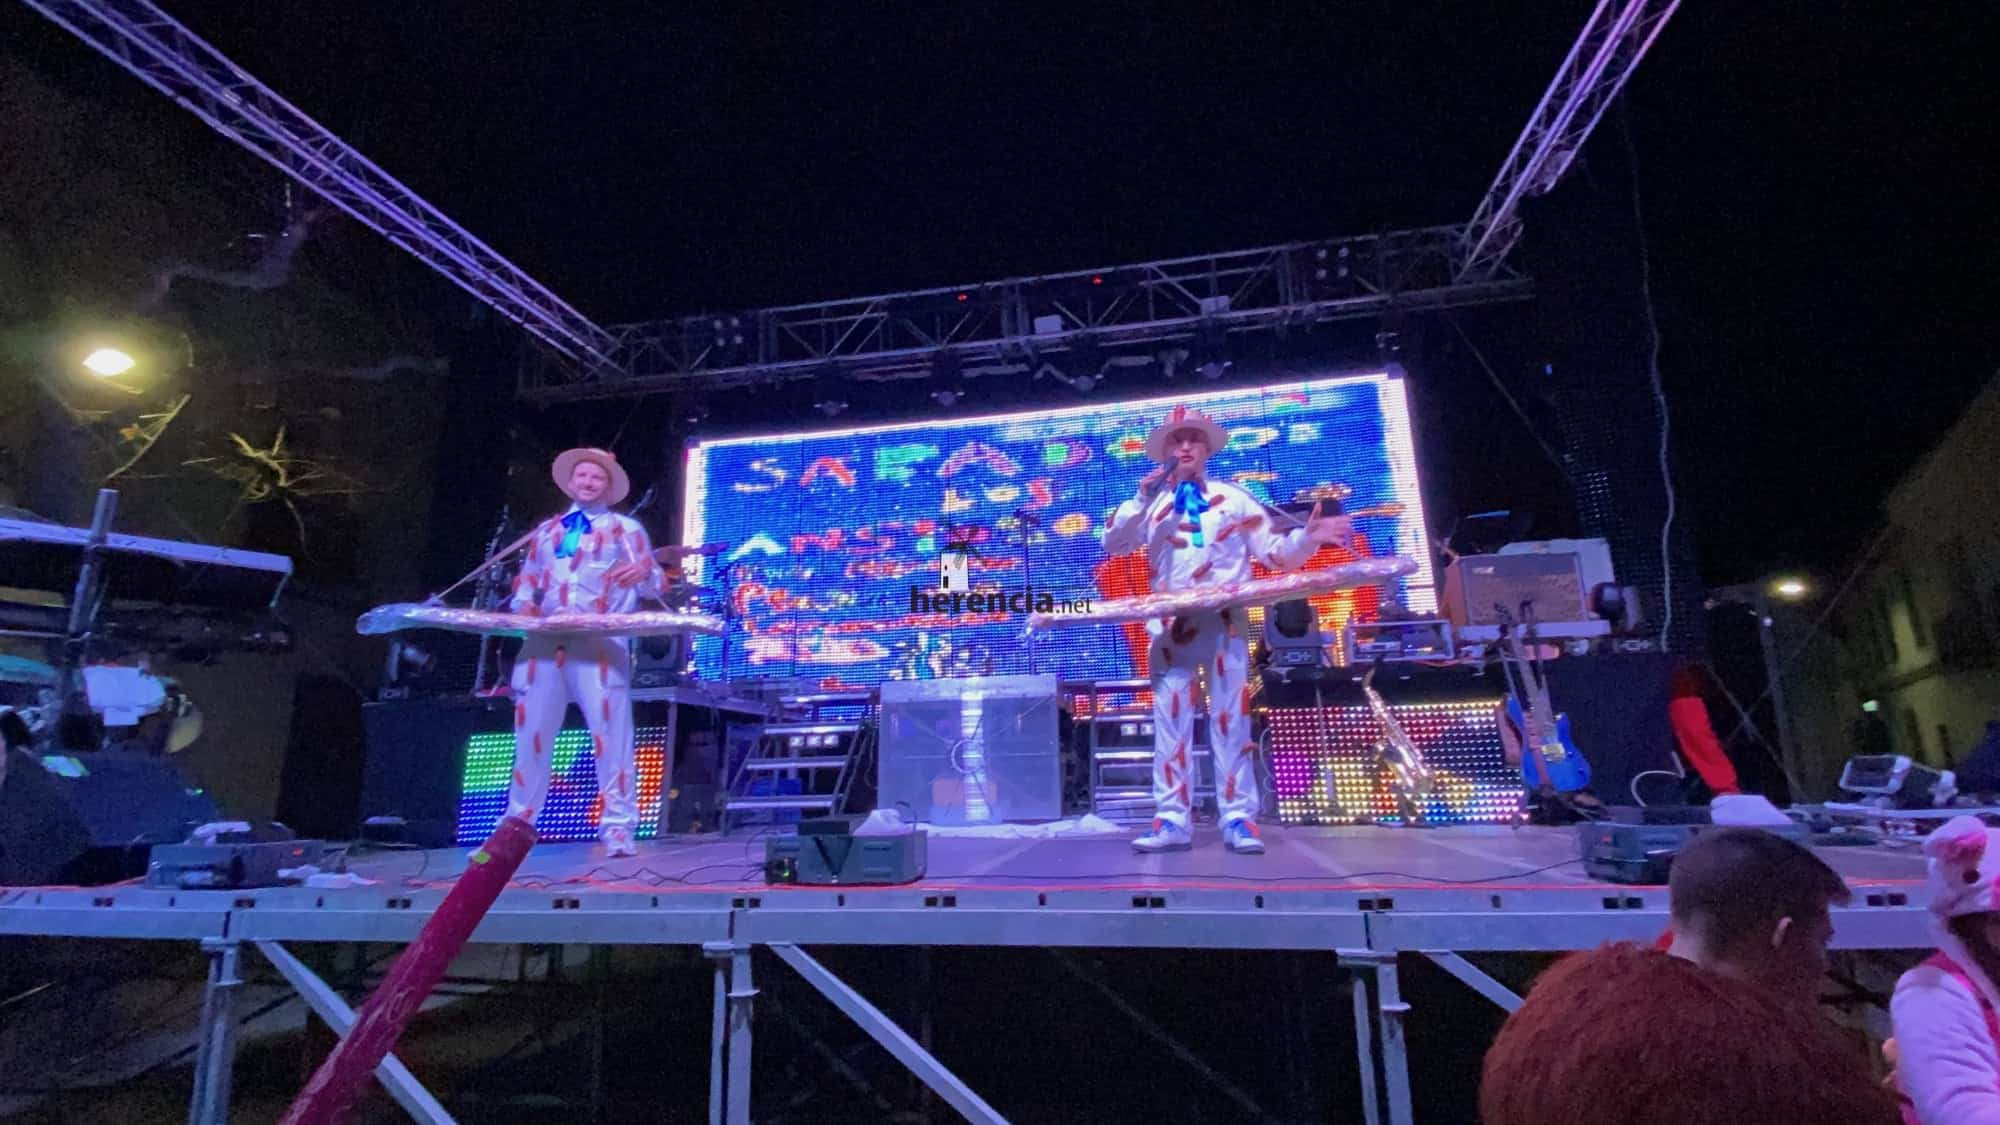 Carnaval de herencia 2019 sabados ansiosos 4 - Inaugurado el Carnaval de Herencia 2020 con el Sábado de los Ansiosos